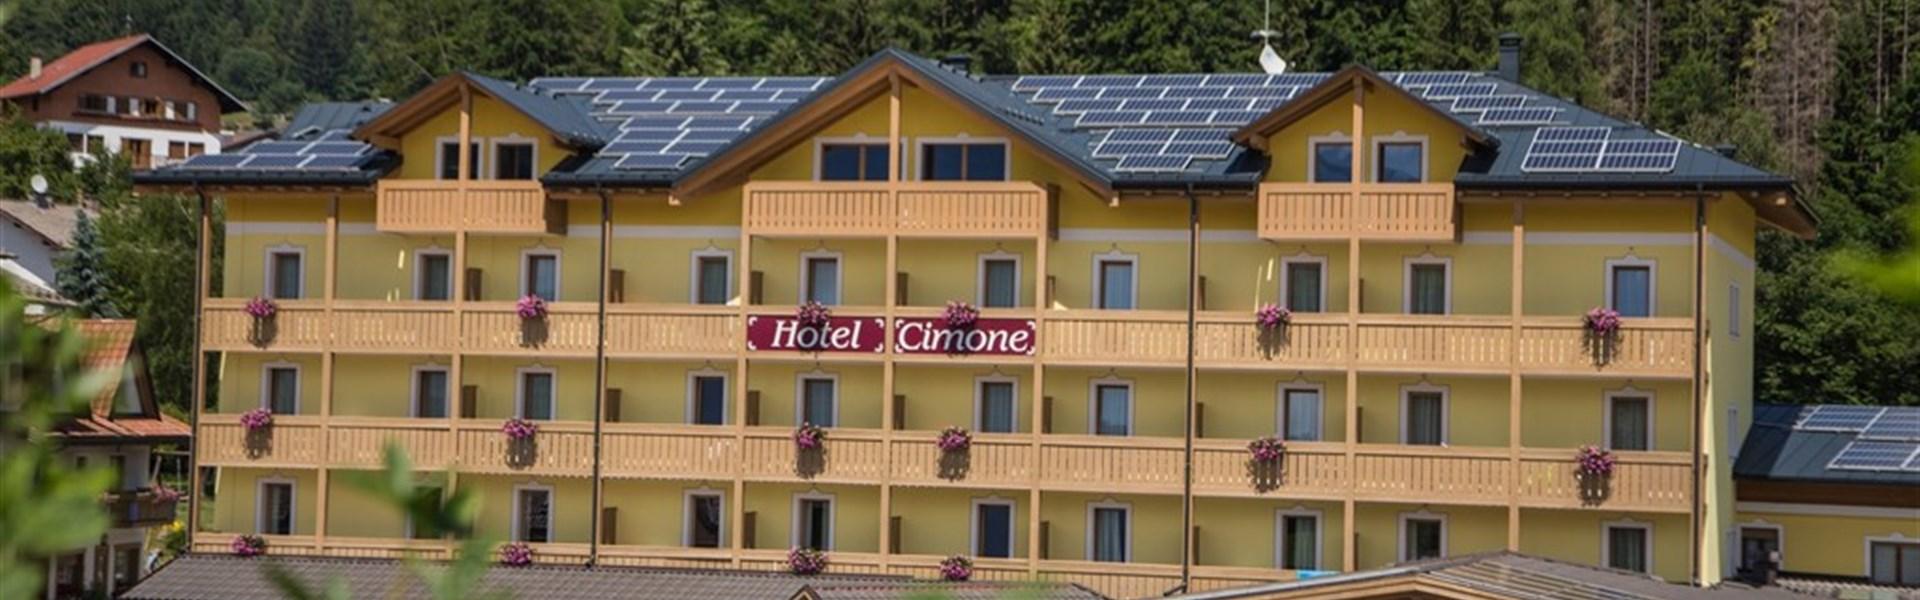 Marco Polo - Hotel Caminetto Mountain Resort -